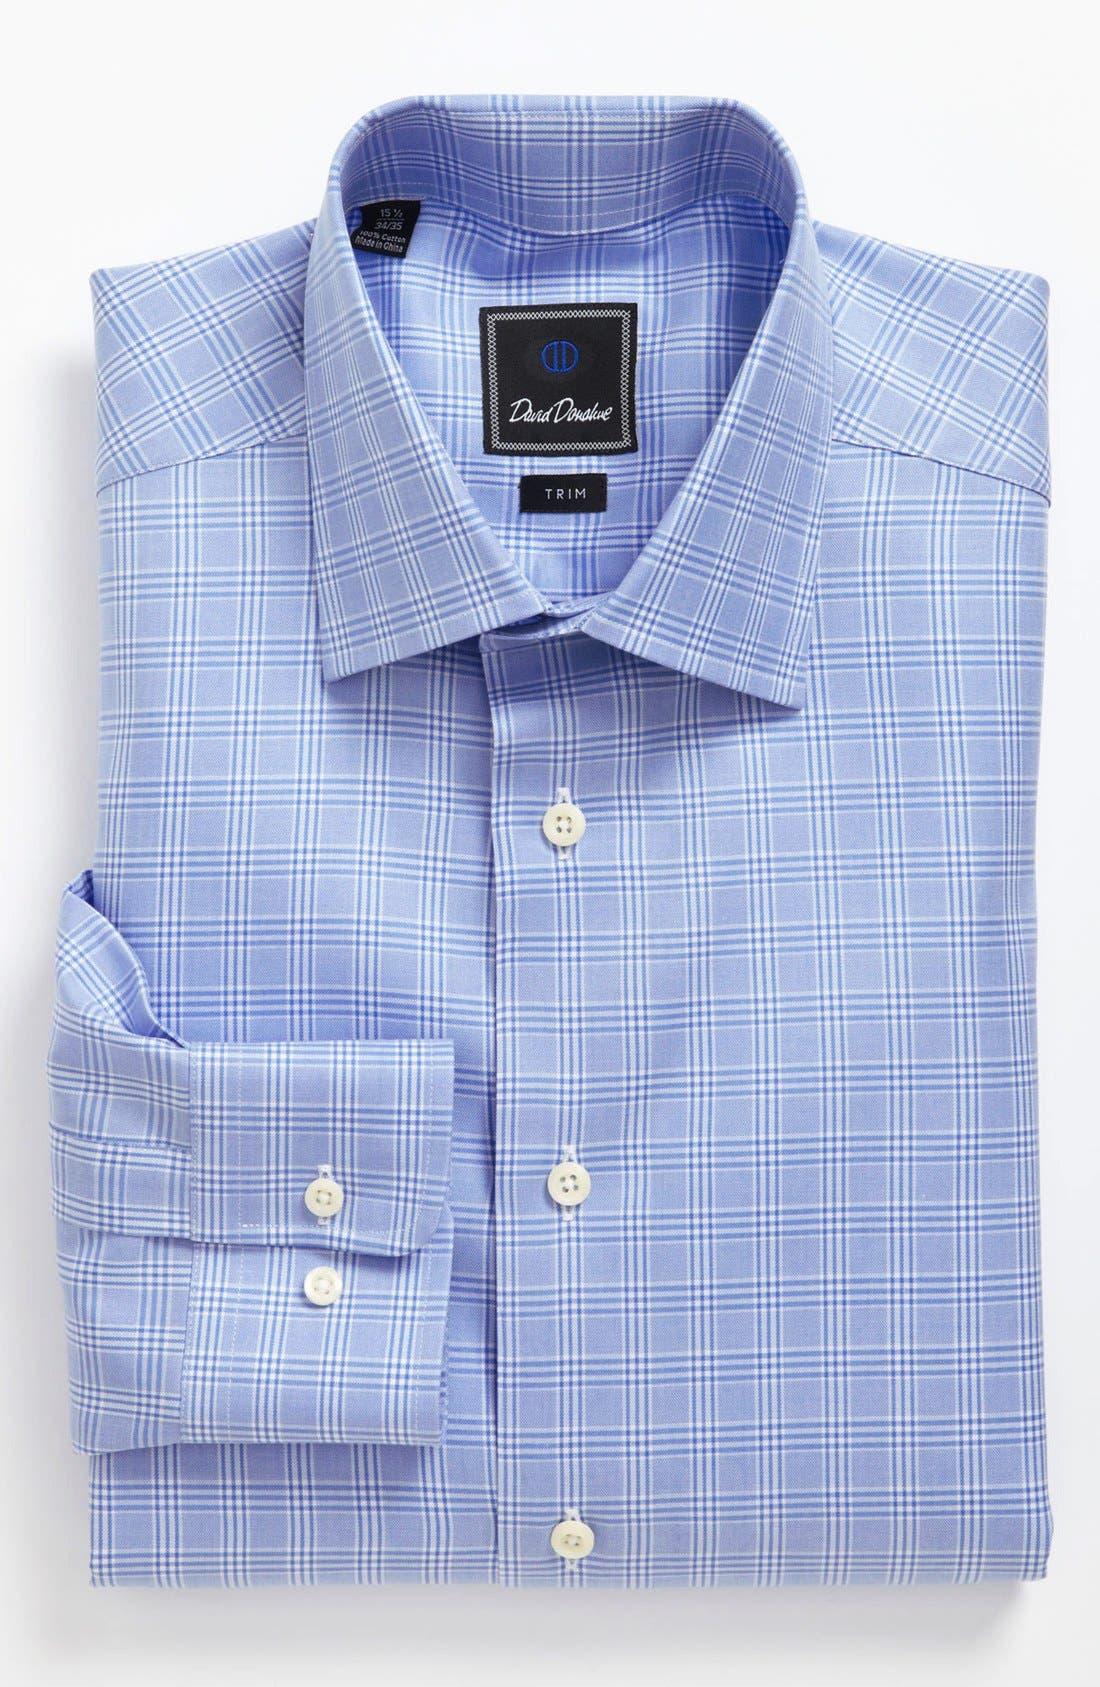 Alternate Image 1 Selected - David Donahue Trim Fit Dress Shirt